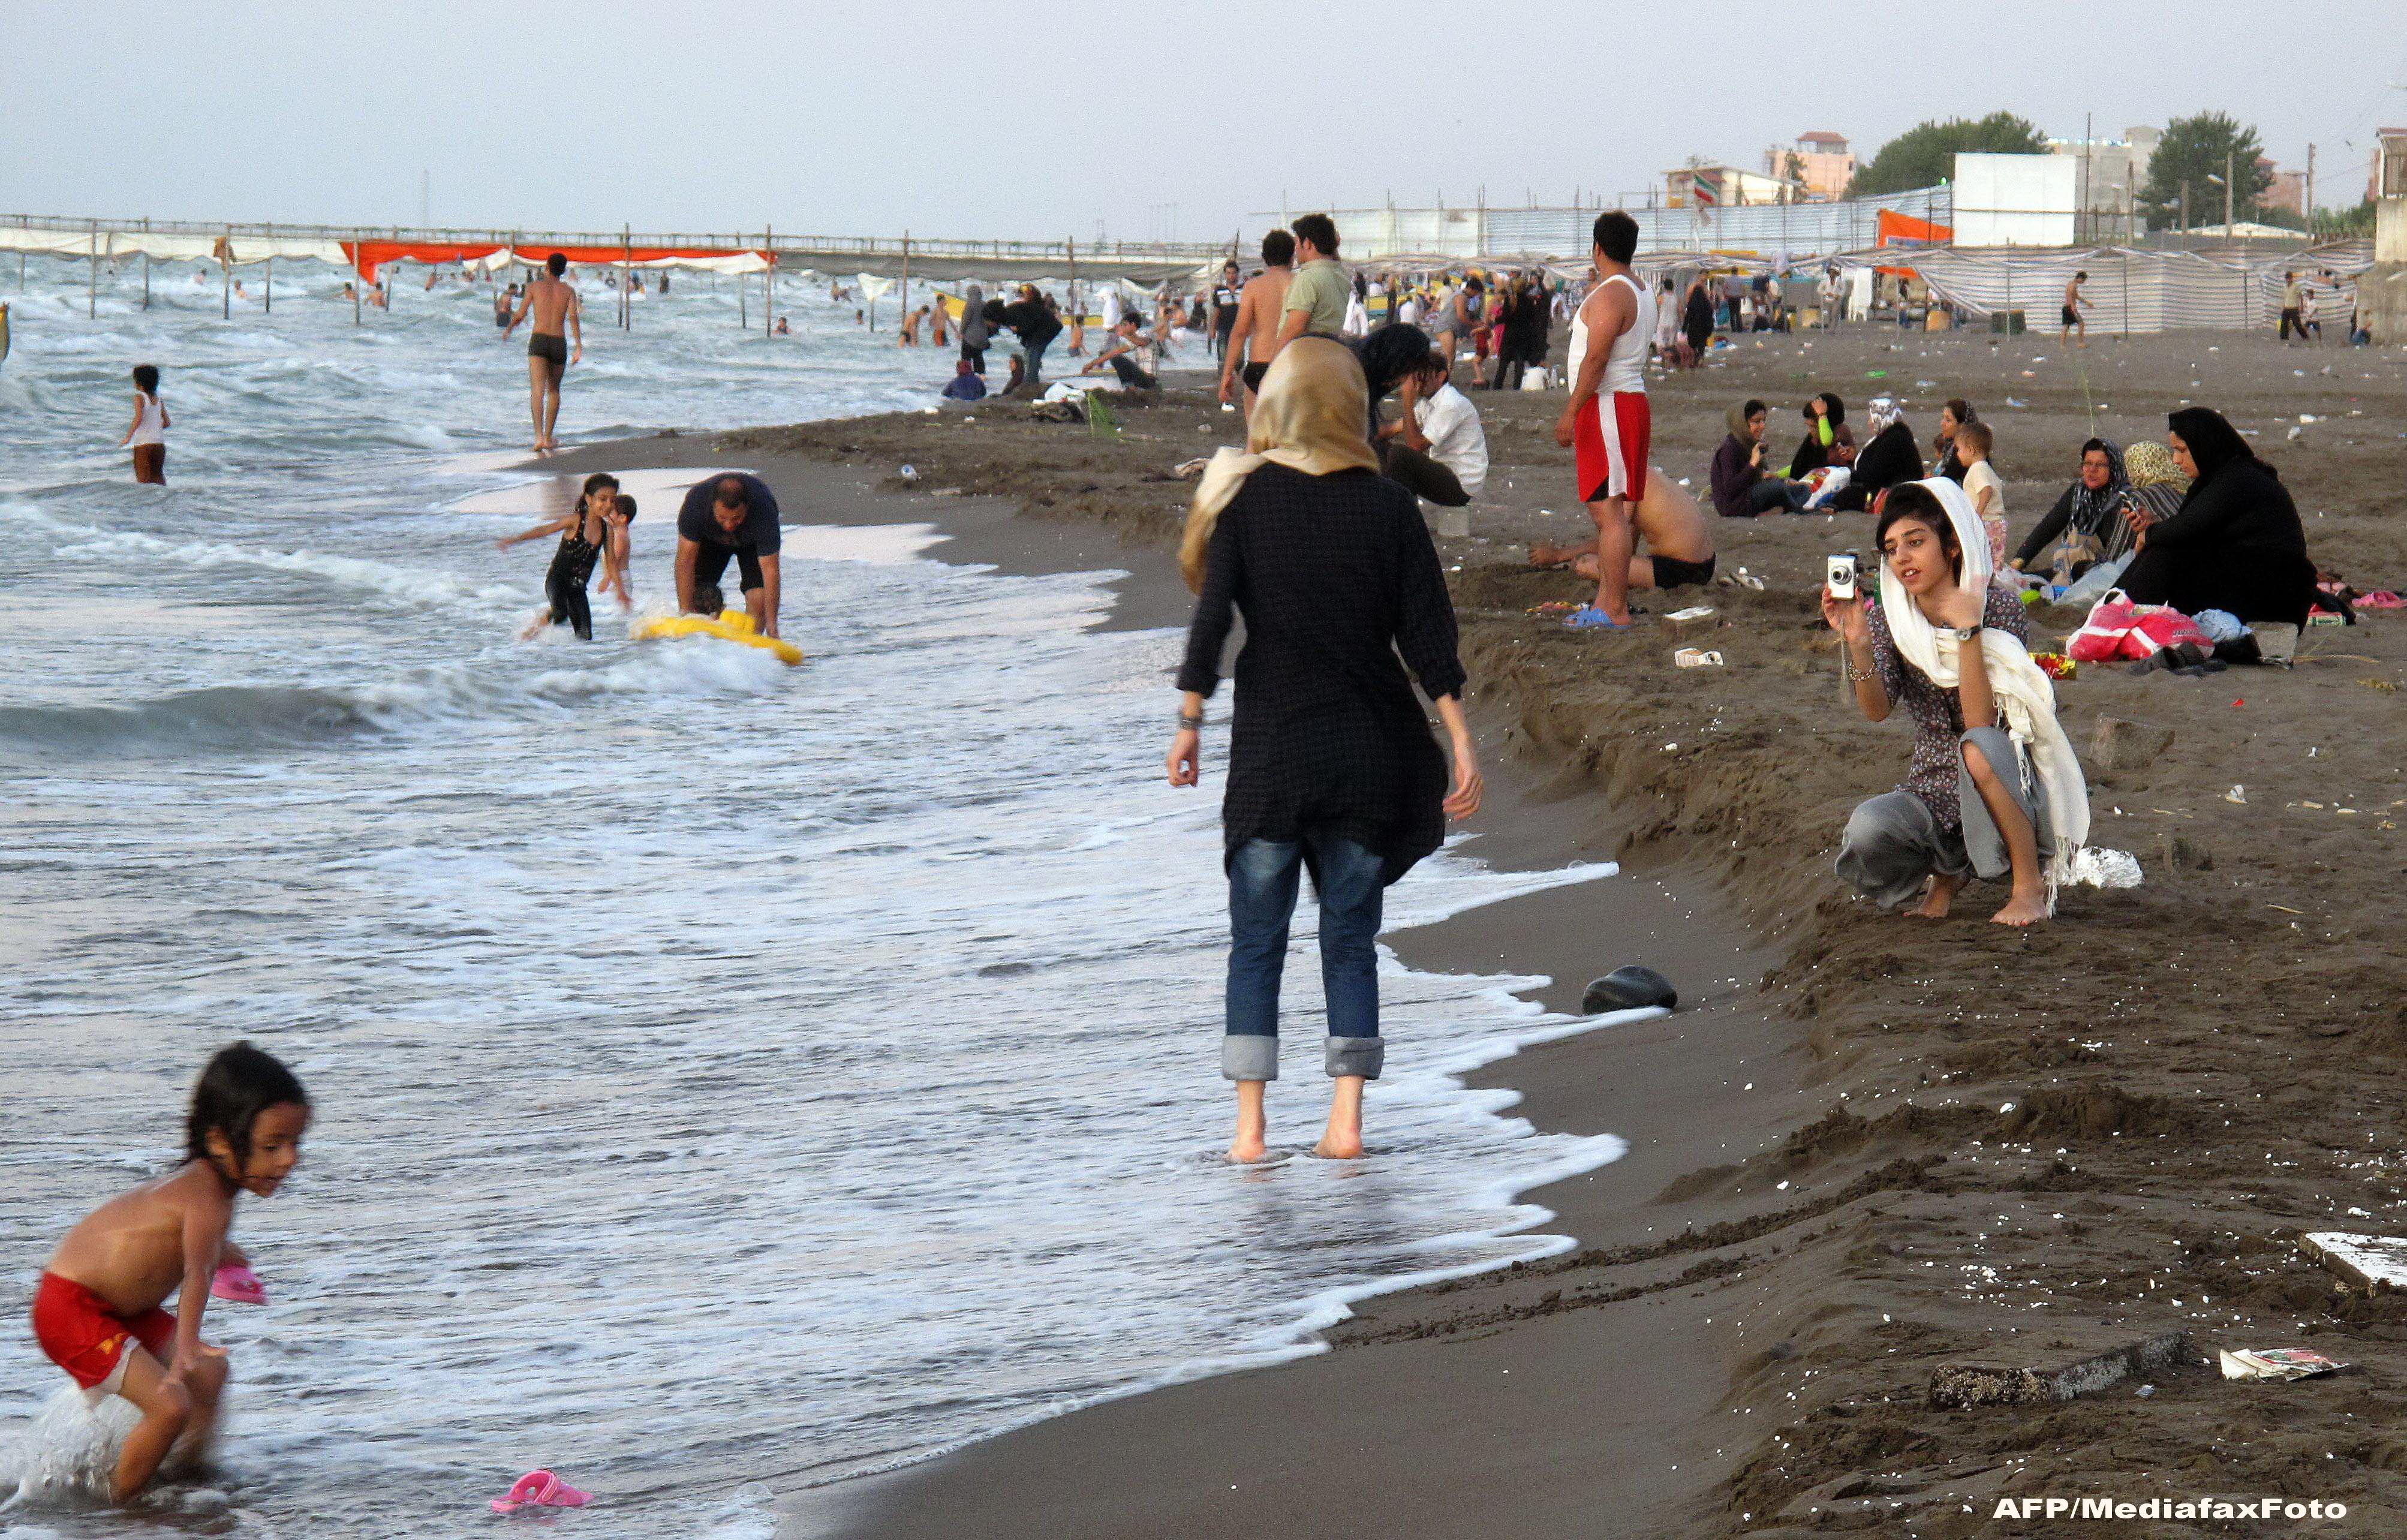 femeie datand de la plaja)